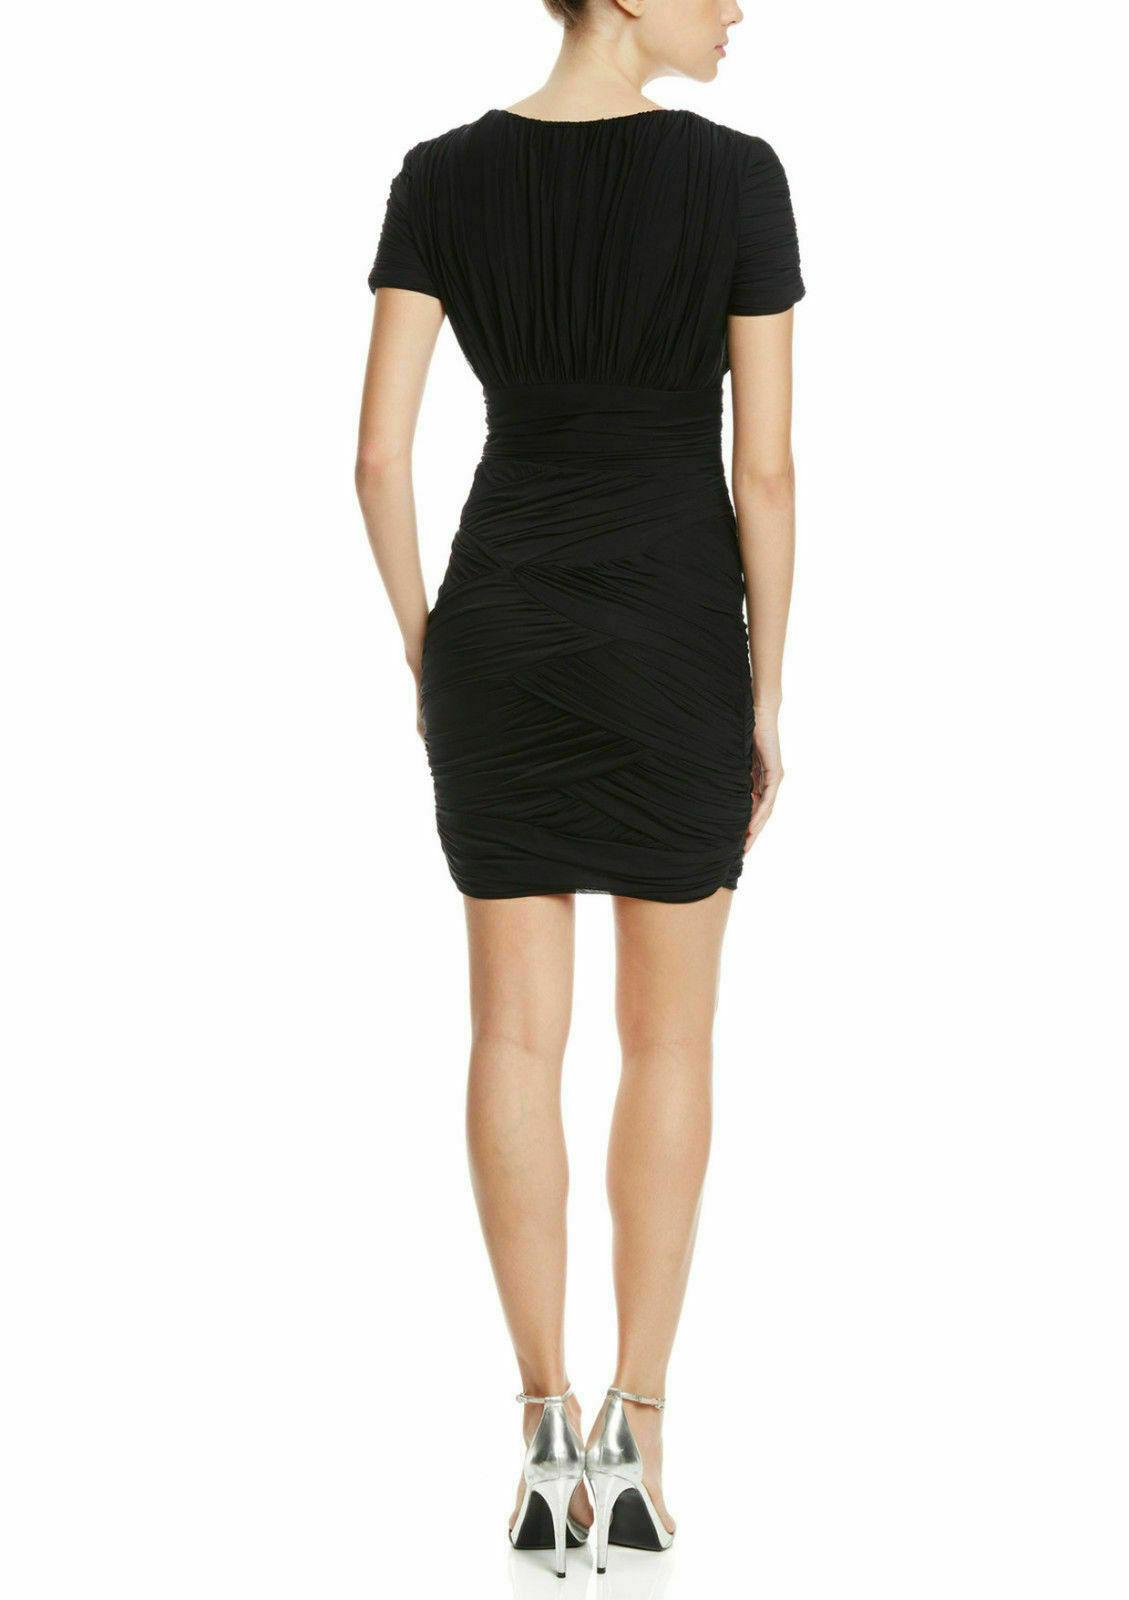 NWT WOMEN Halston Heritage  Ruched Short Sleeve Jersey Mini XS Dress $395 image 2